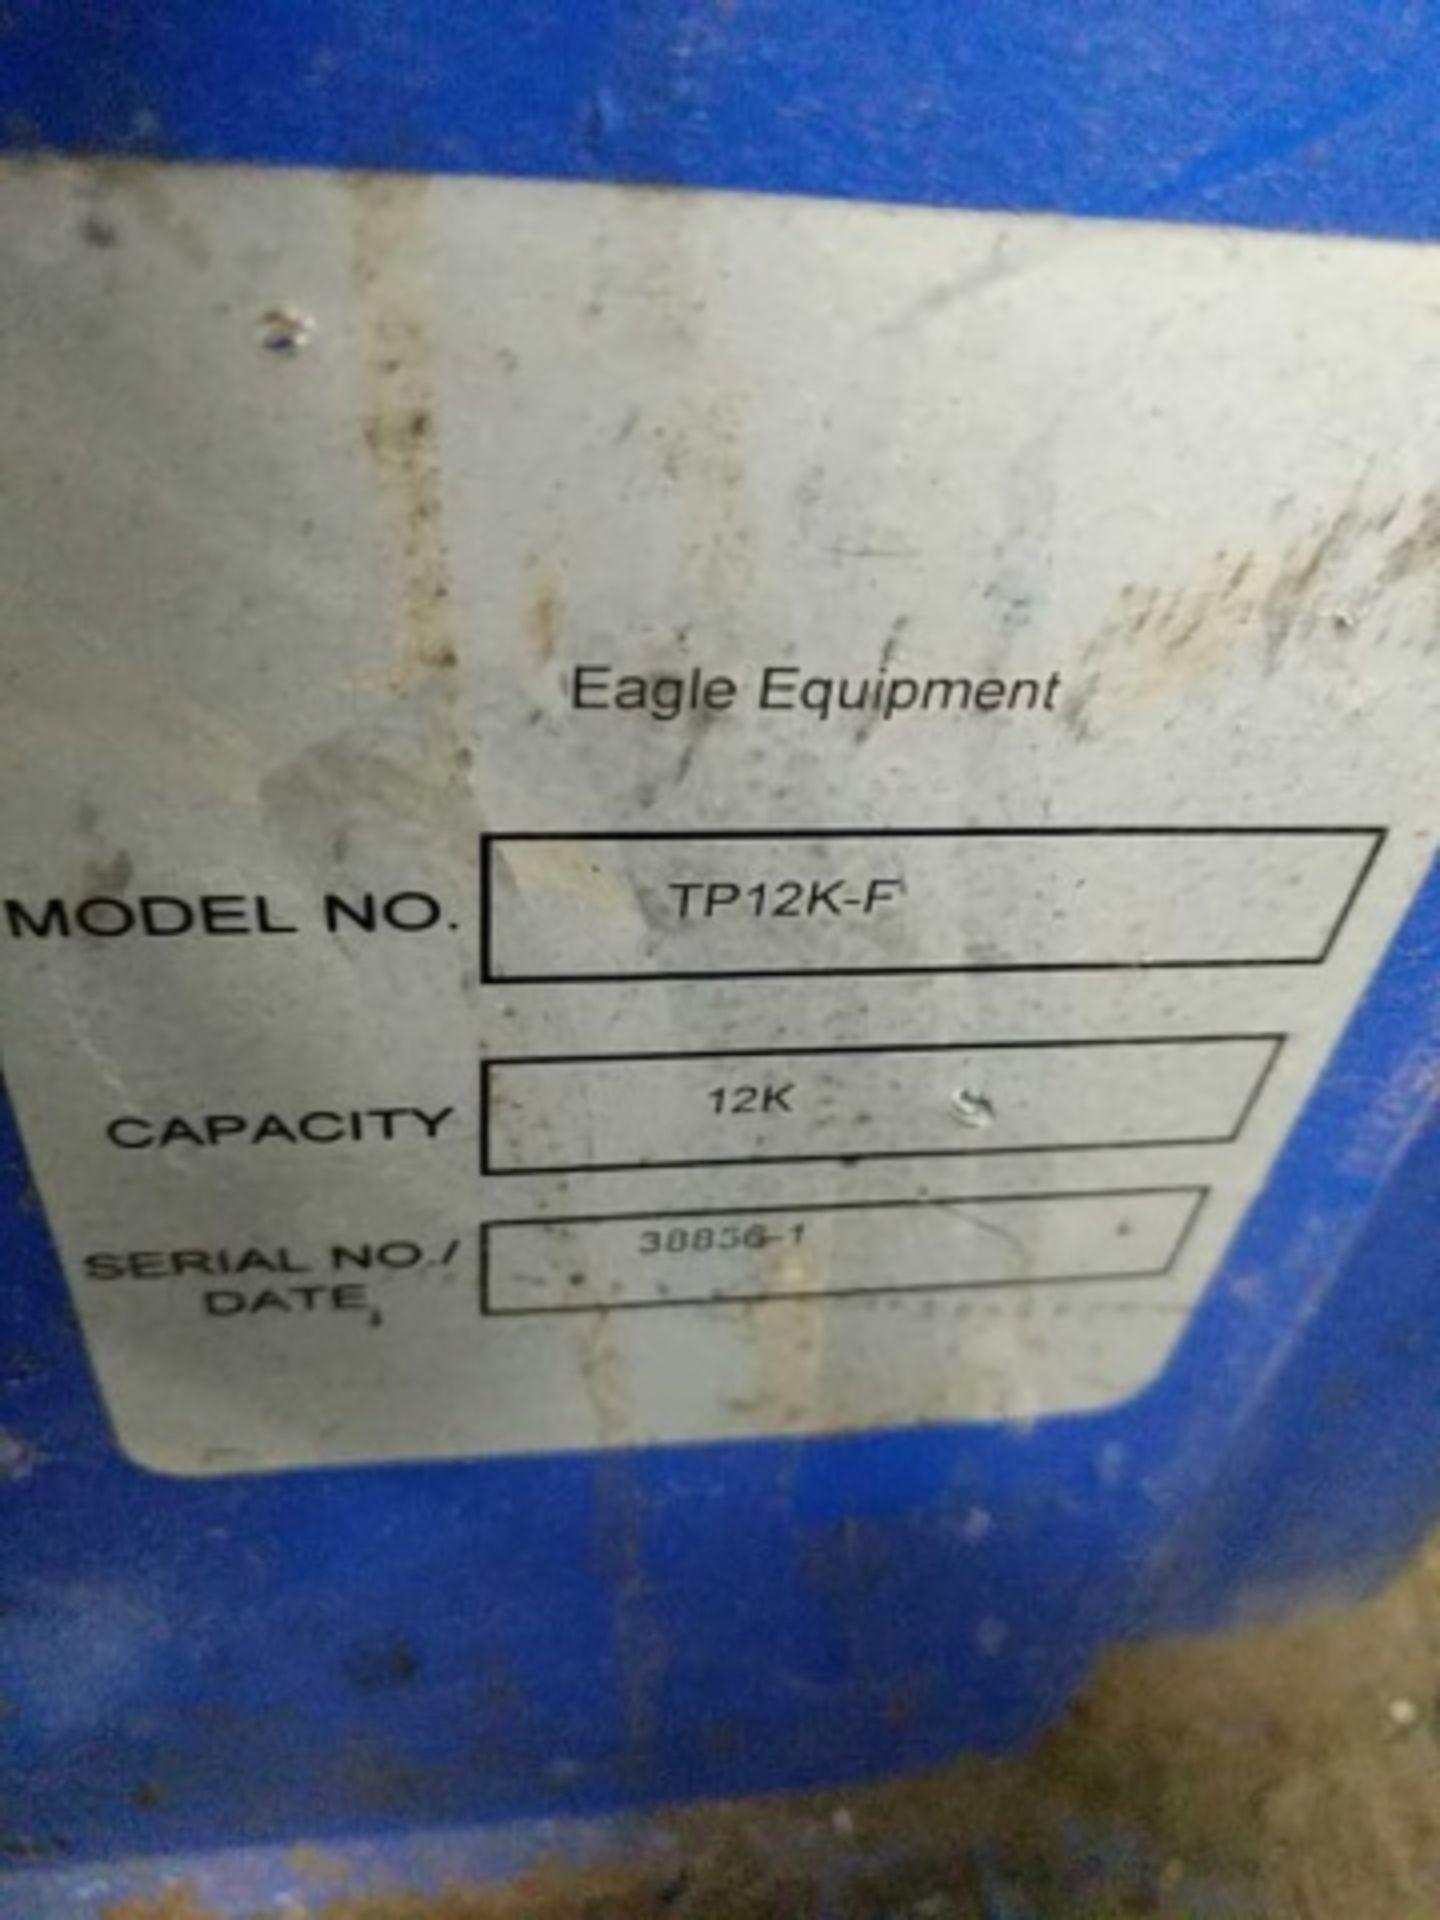 Eagle TP12K-F Automotive Lift - Image 4 of 7